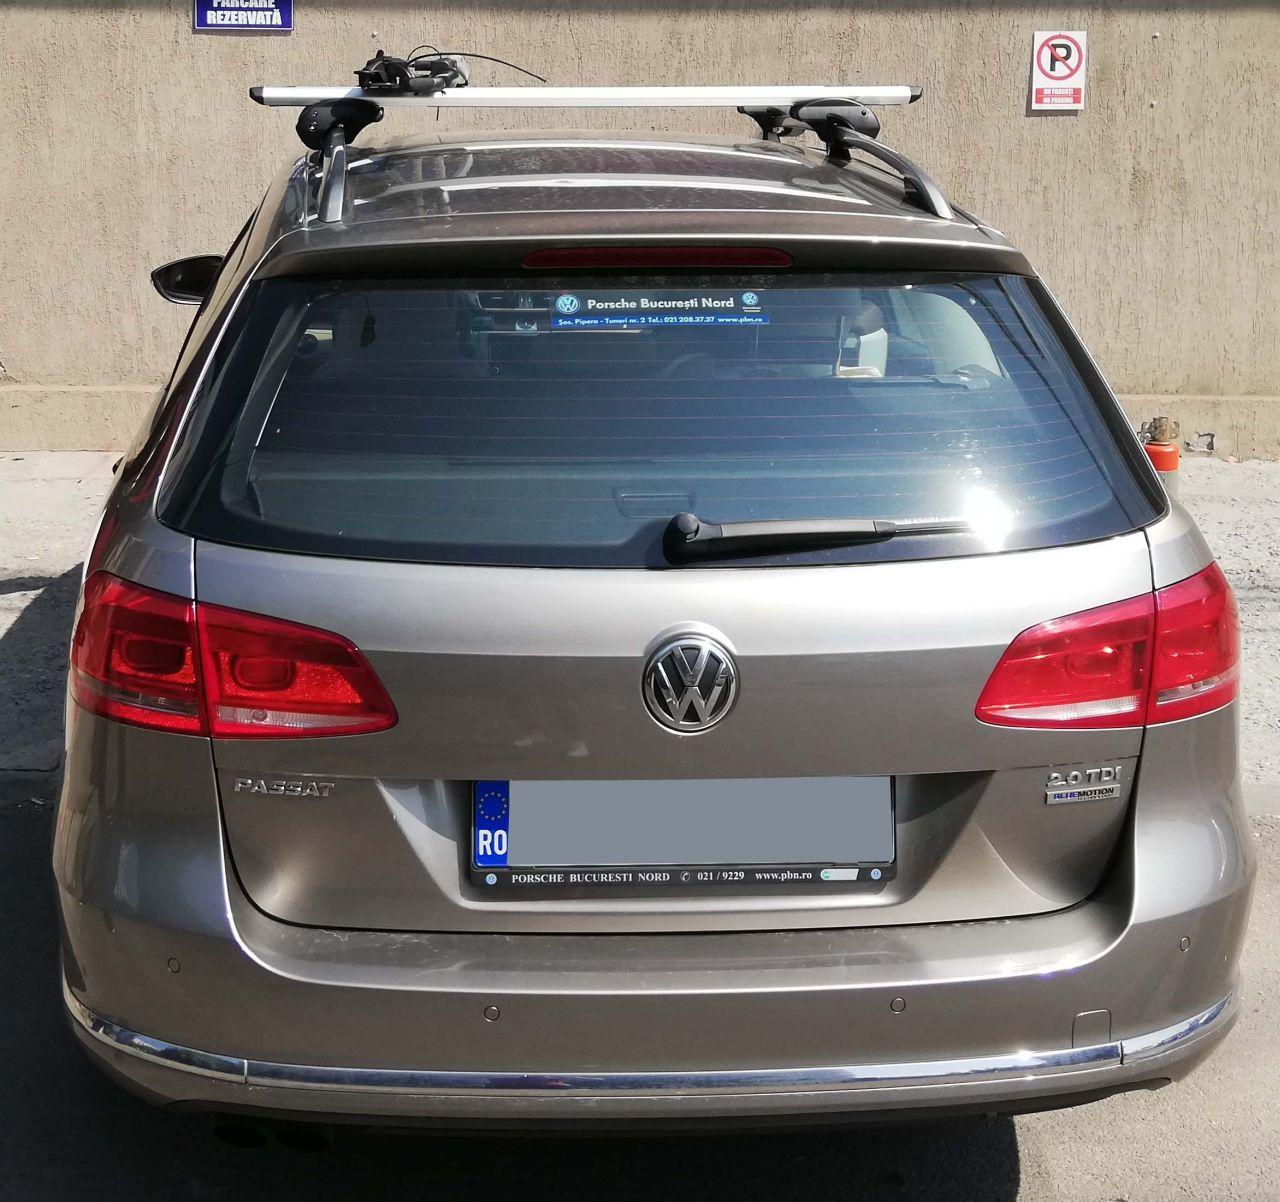 Volkswagen Passat bare transversale Menabo Sherman si suport bicicleta Thule Freeride